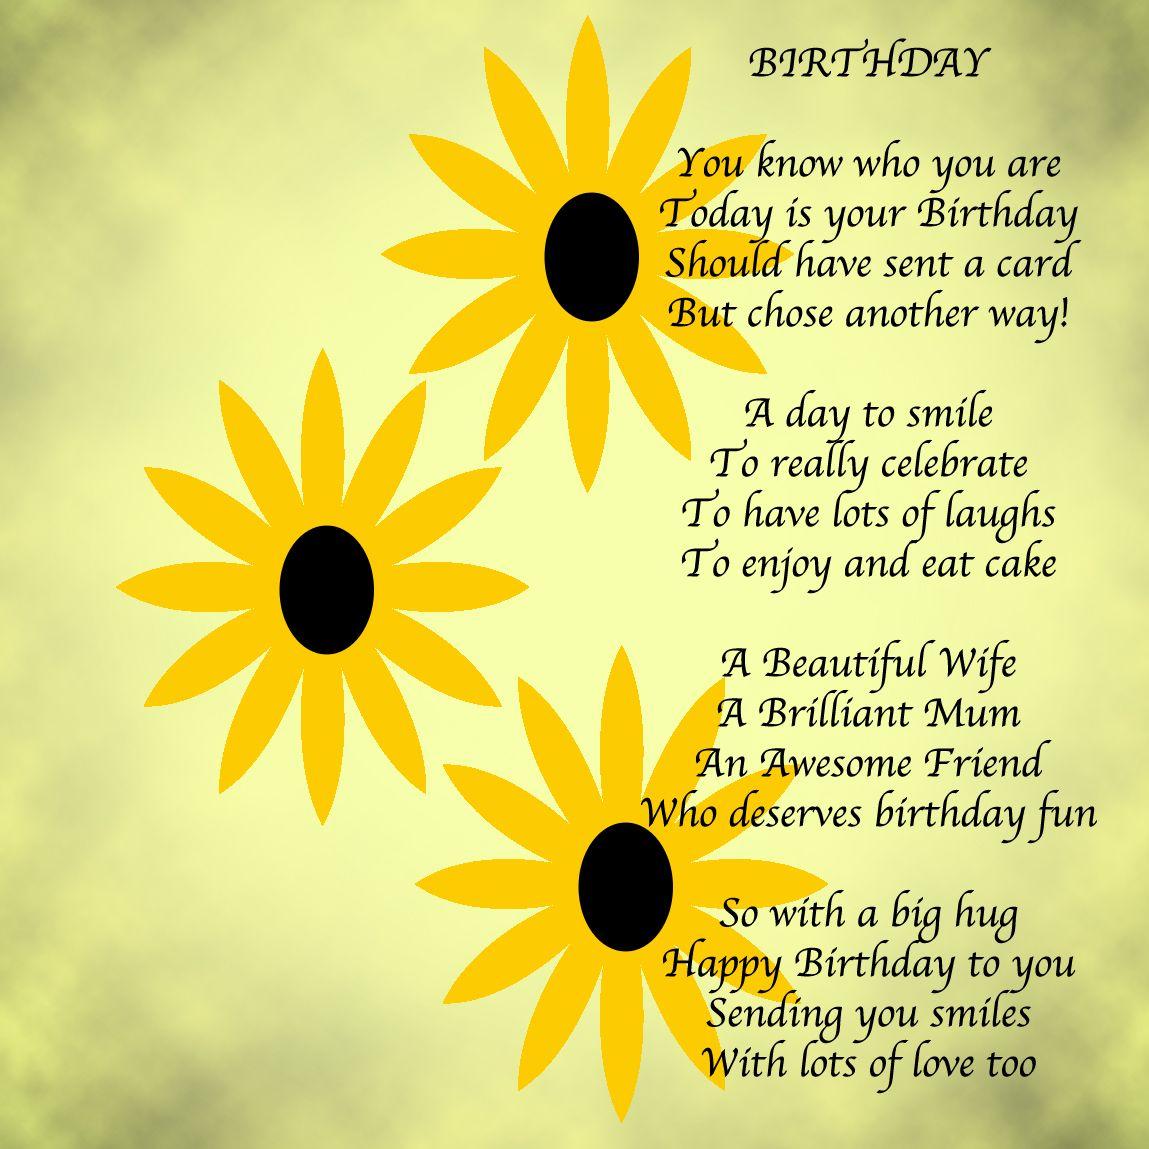 A Birthday Message Birthday card sayings, Birthday